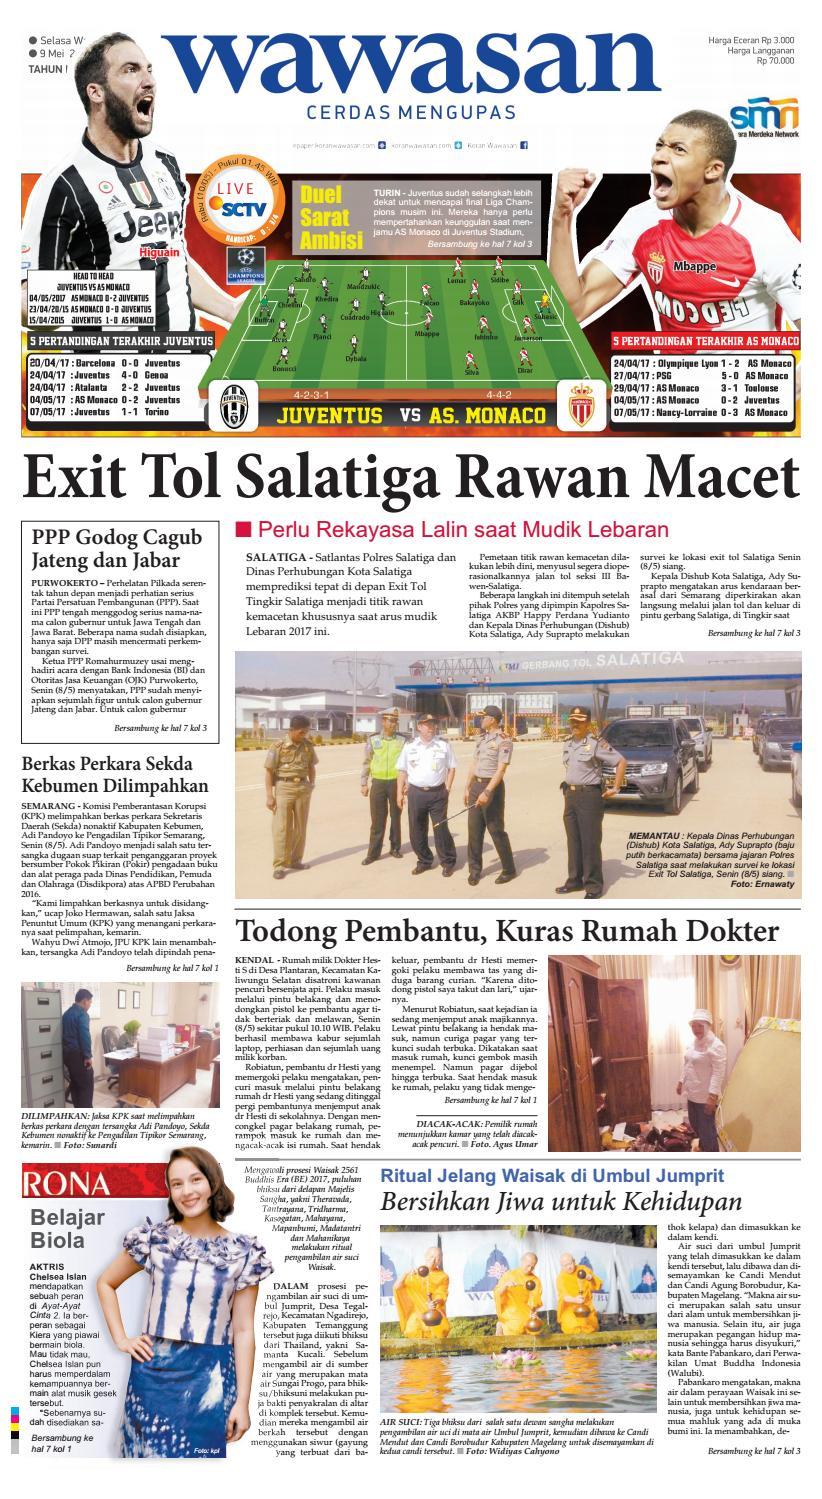 Wawasan 09 Mei 2017 By Koran Pagi Issuu Kopibubuk Robusta Toko Rezeki Akumandiri Malang